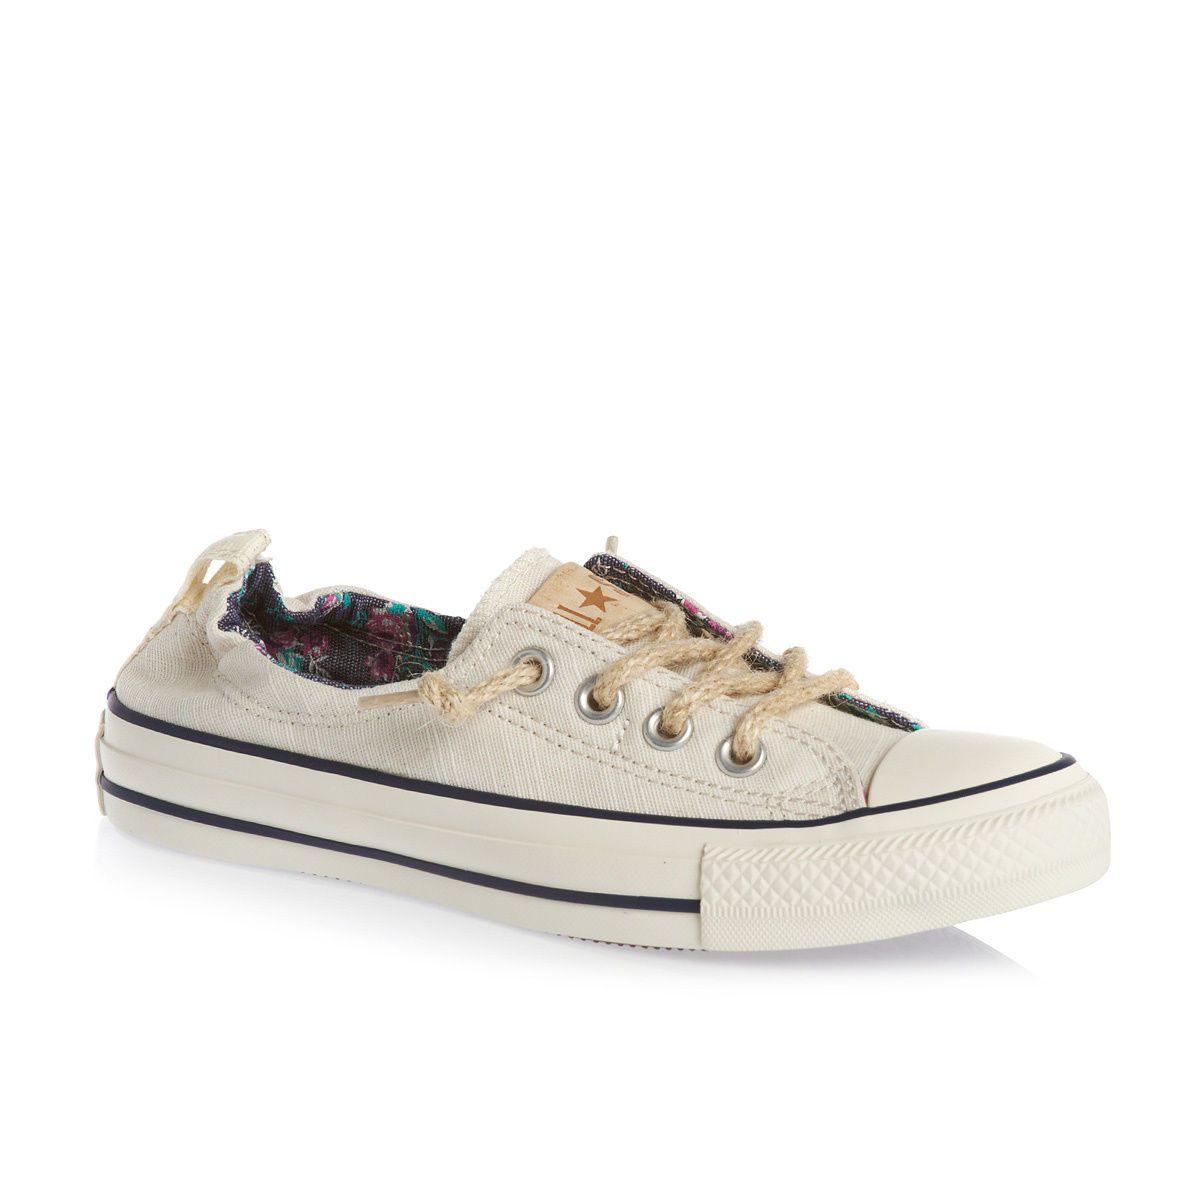 Converse Chuck Taylor All Star Shoreline Shoes - Natural